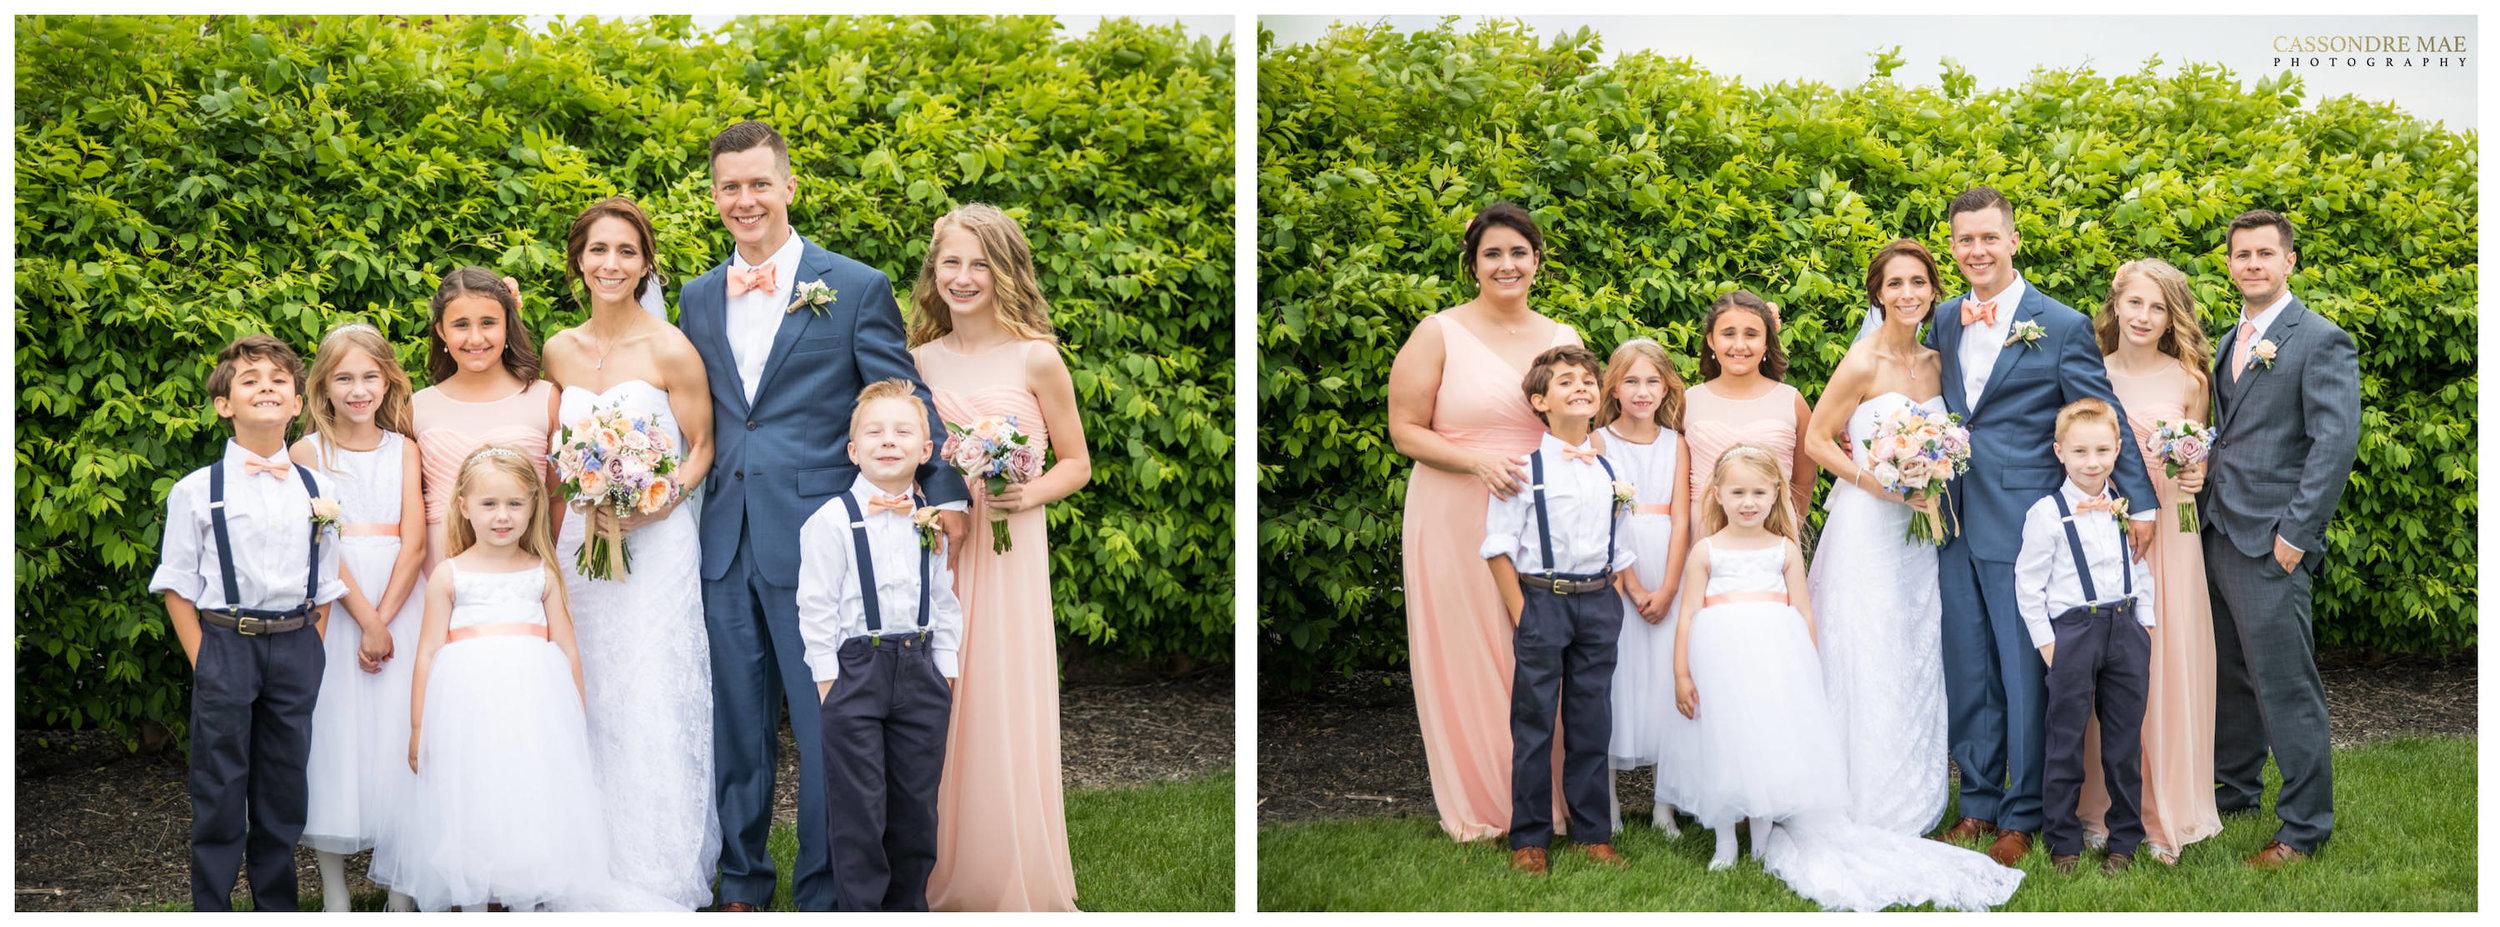 Cassondre Mae Photography Links at Unionvale Wedding 11.jpg